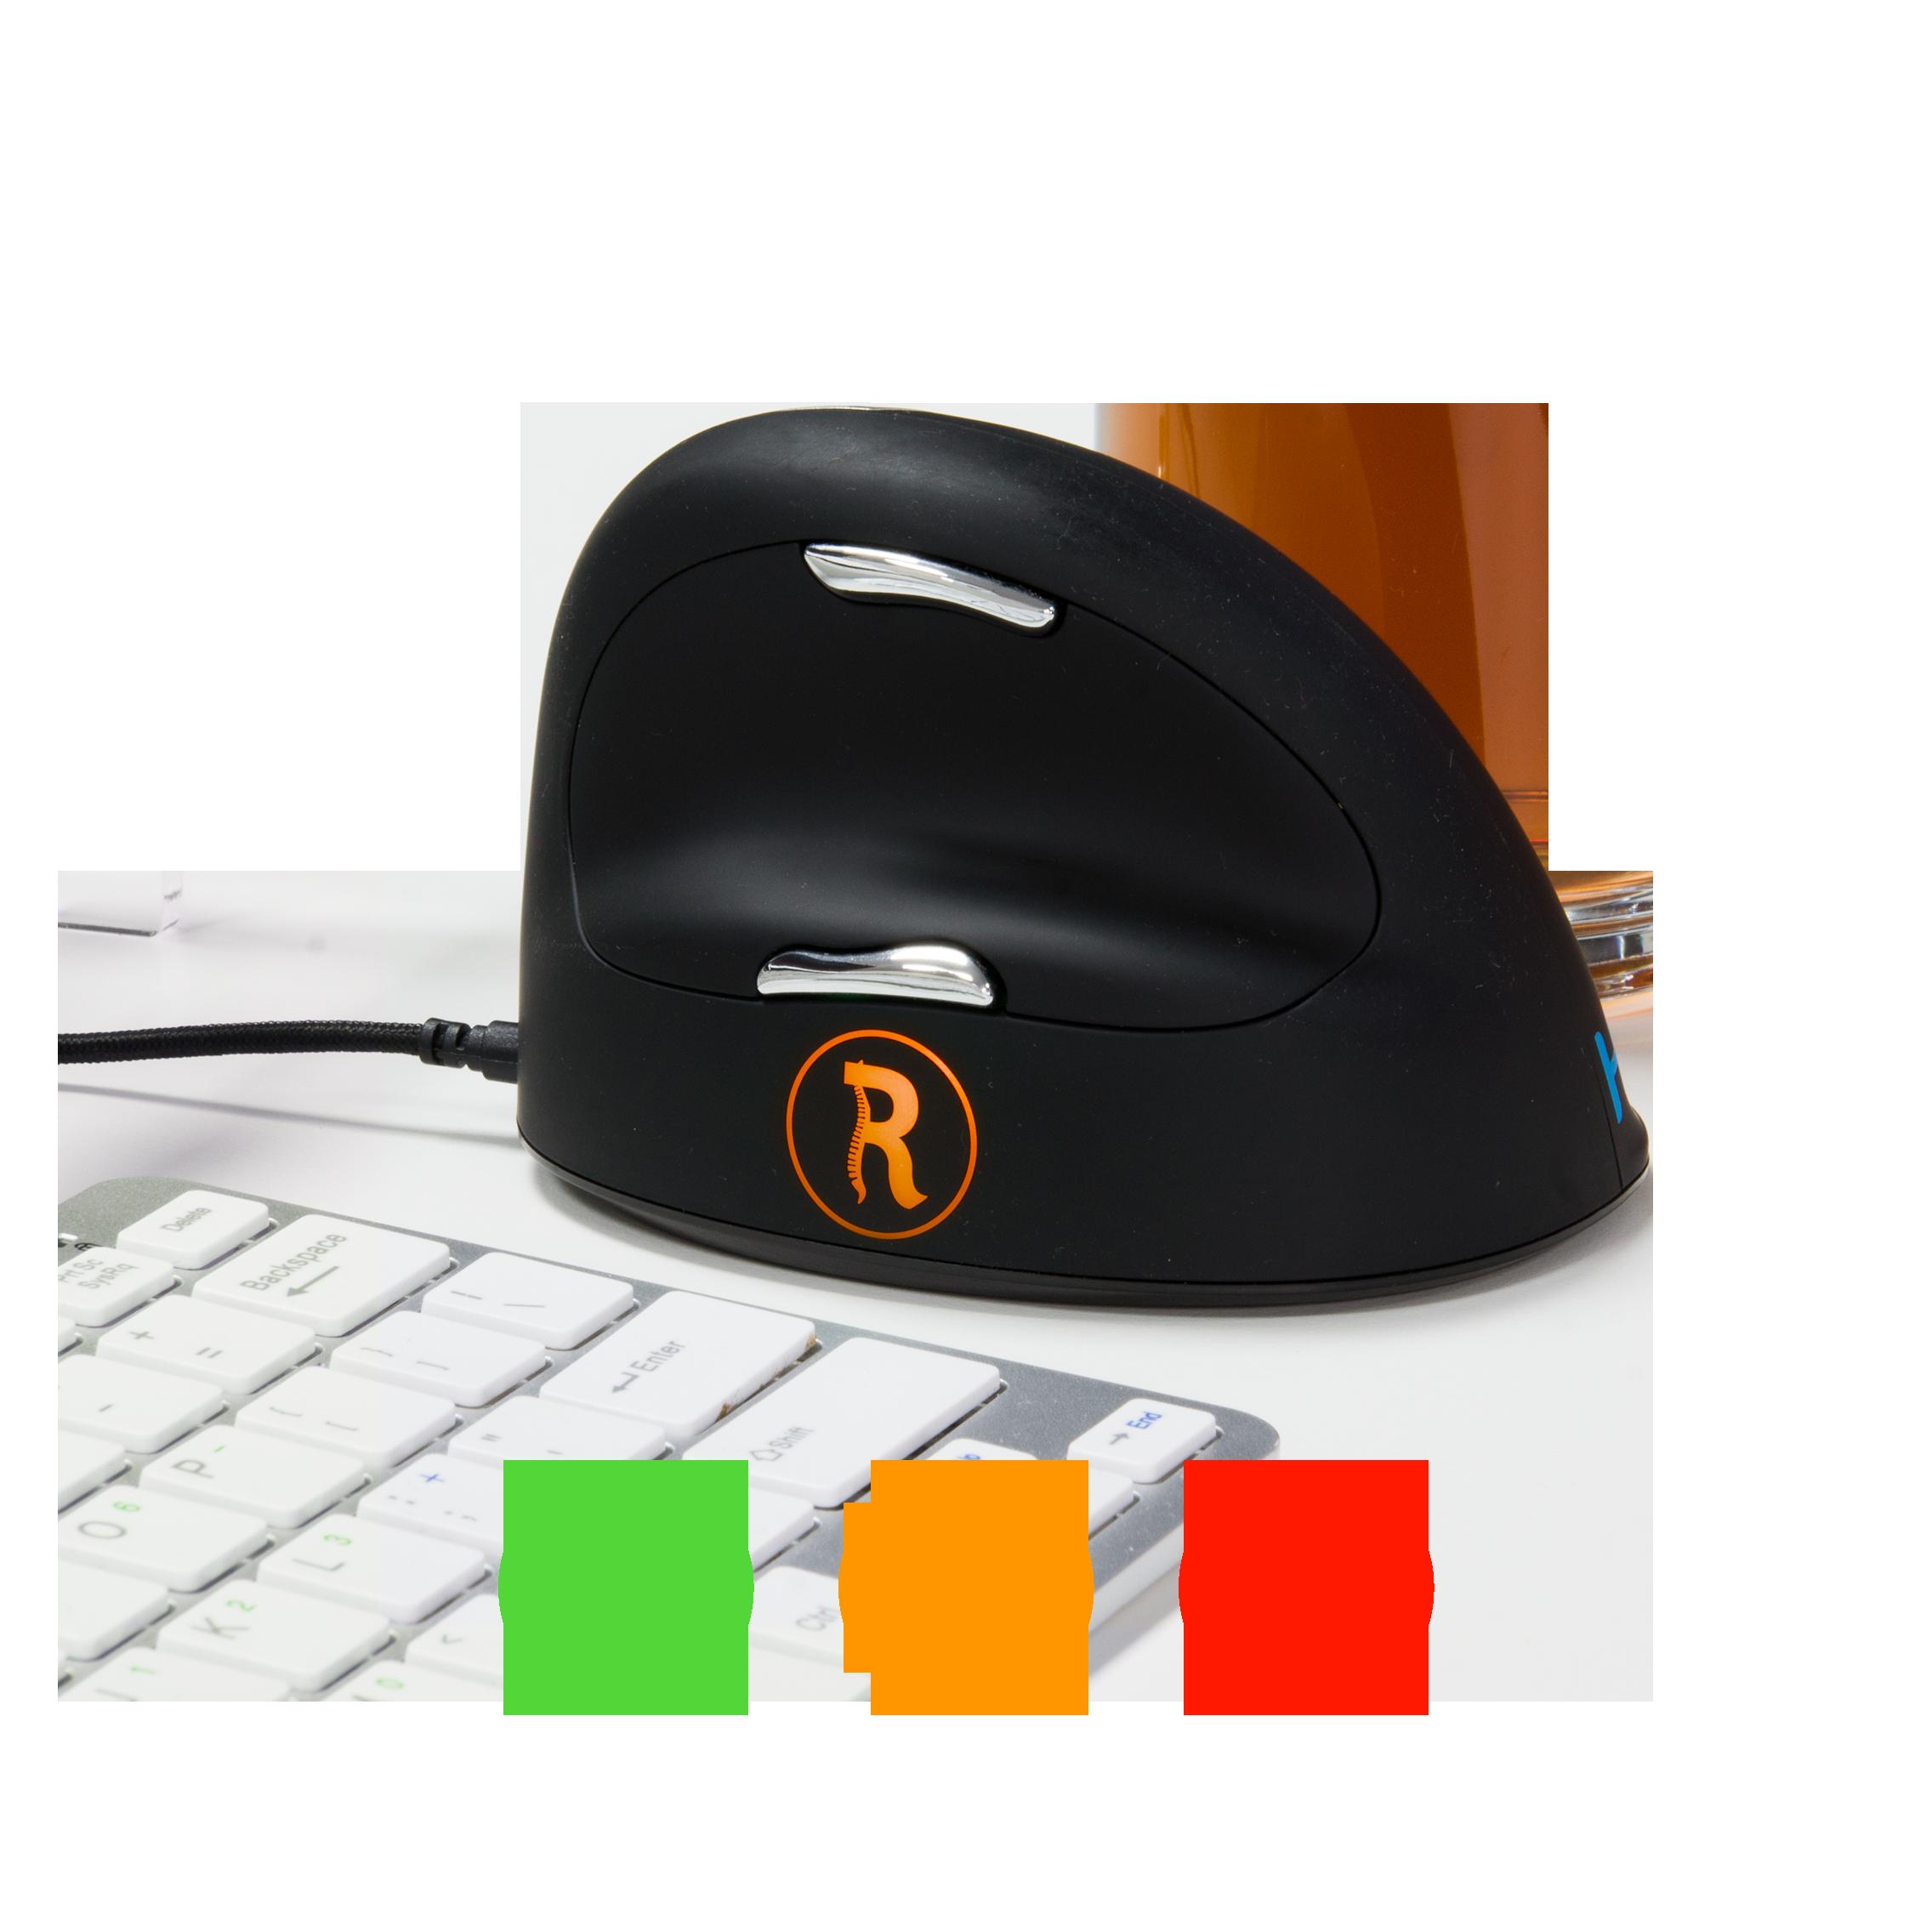 R-Go break HE mouse